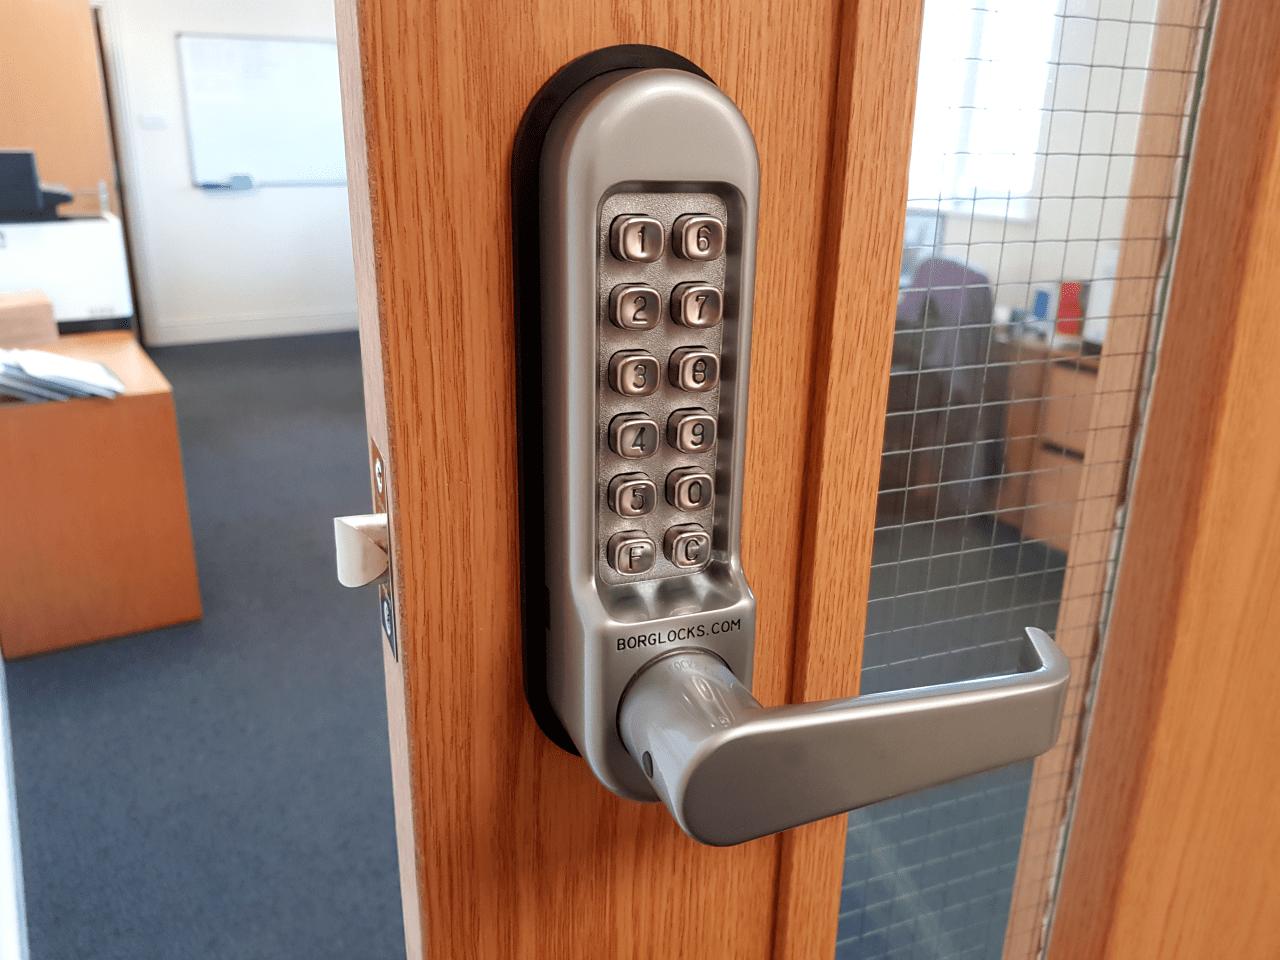 The BL5401 digital combination lock from Borg Locks